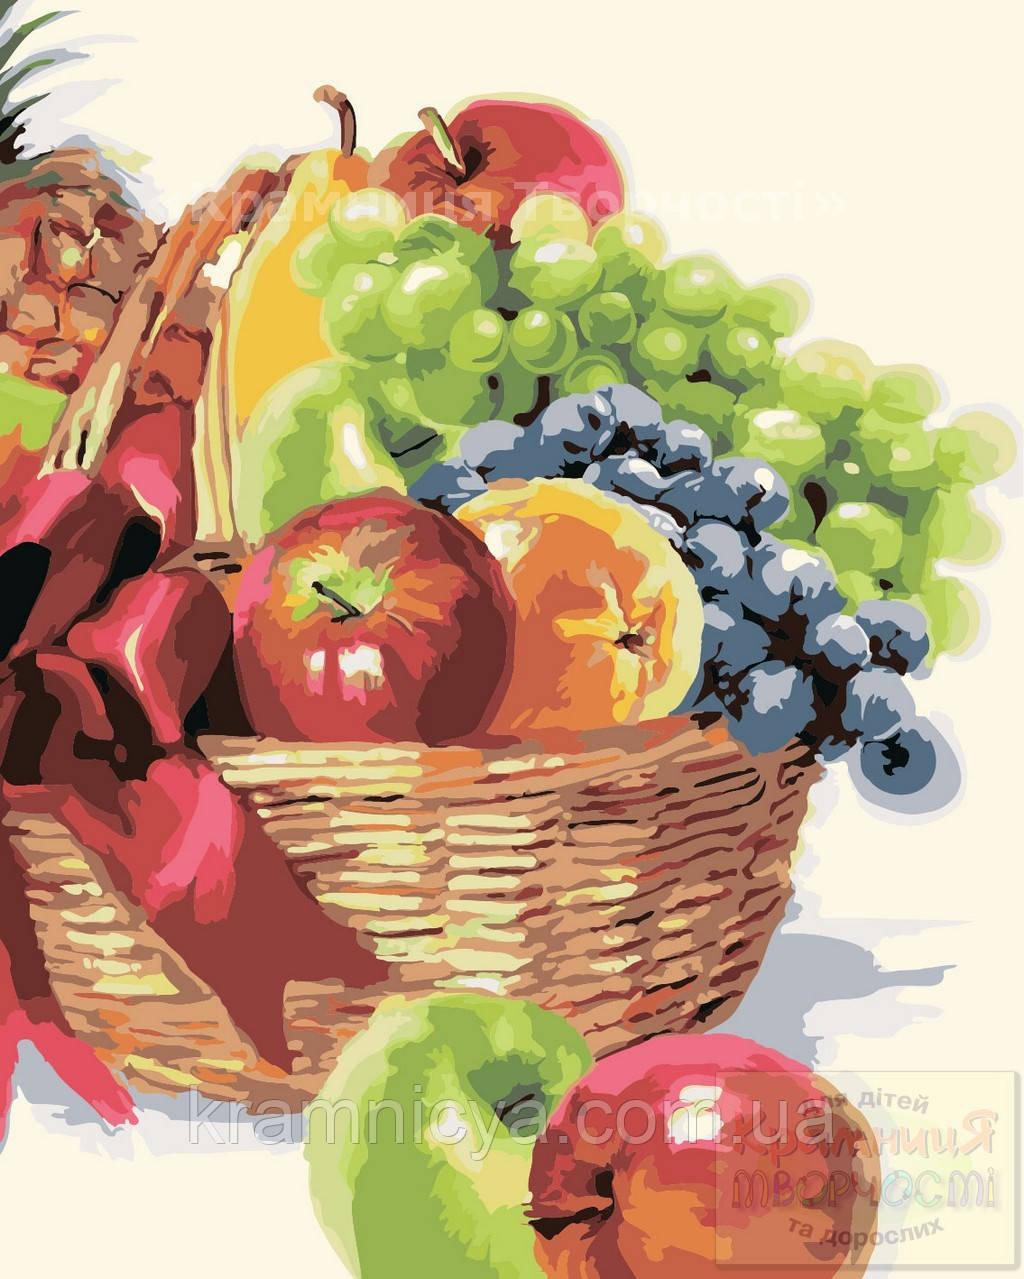 Картина по номерам: Корзинка фруктов, 40х50см. (КНО2910)